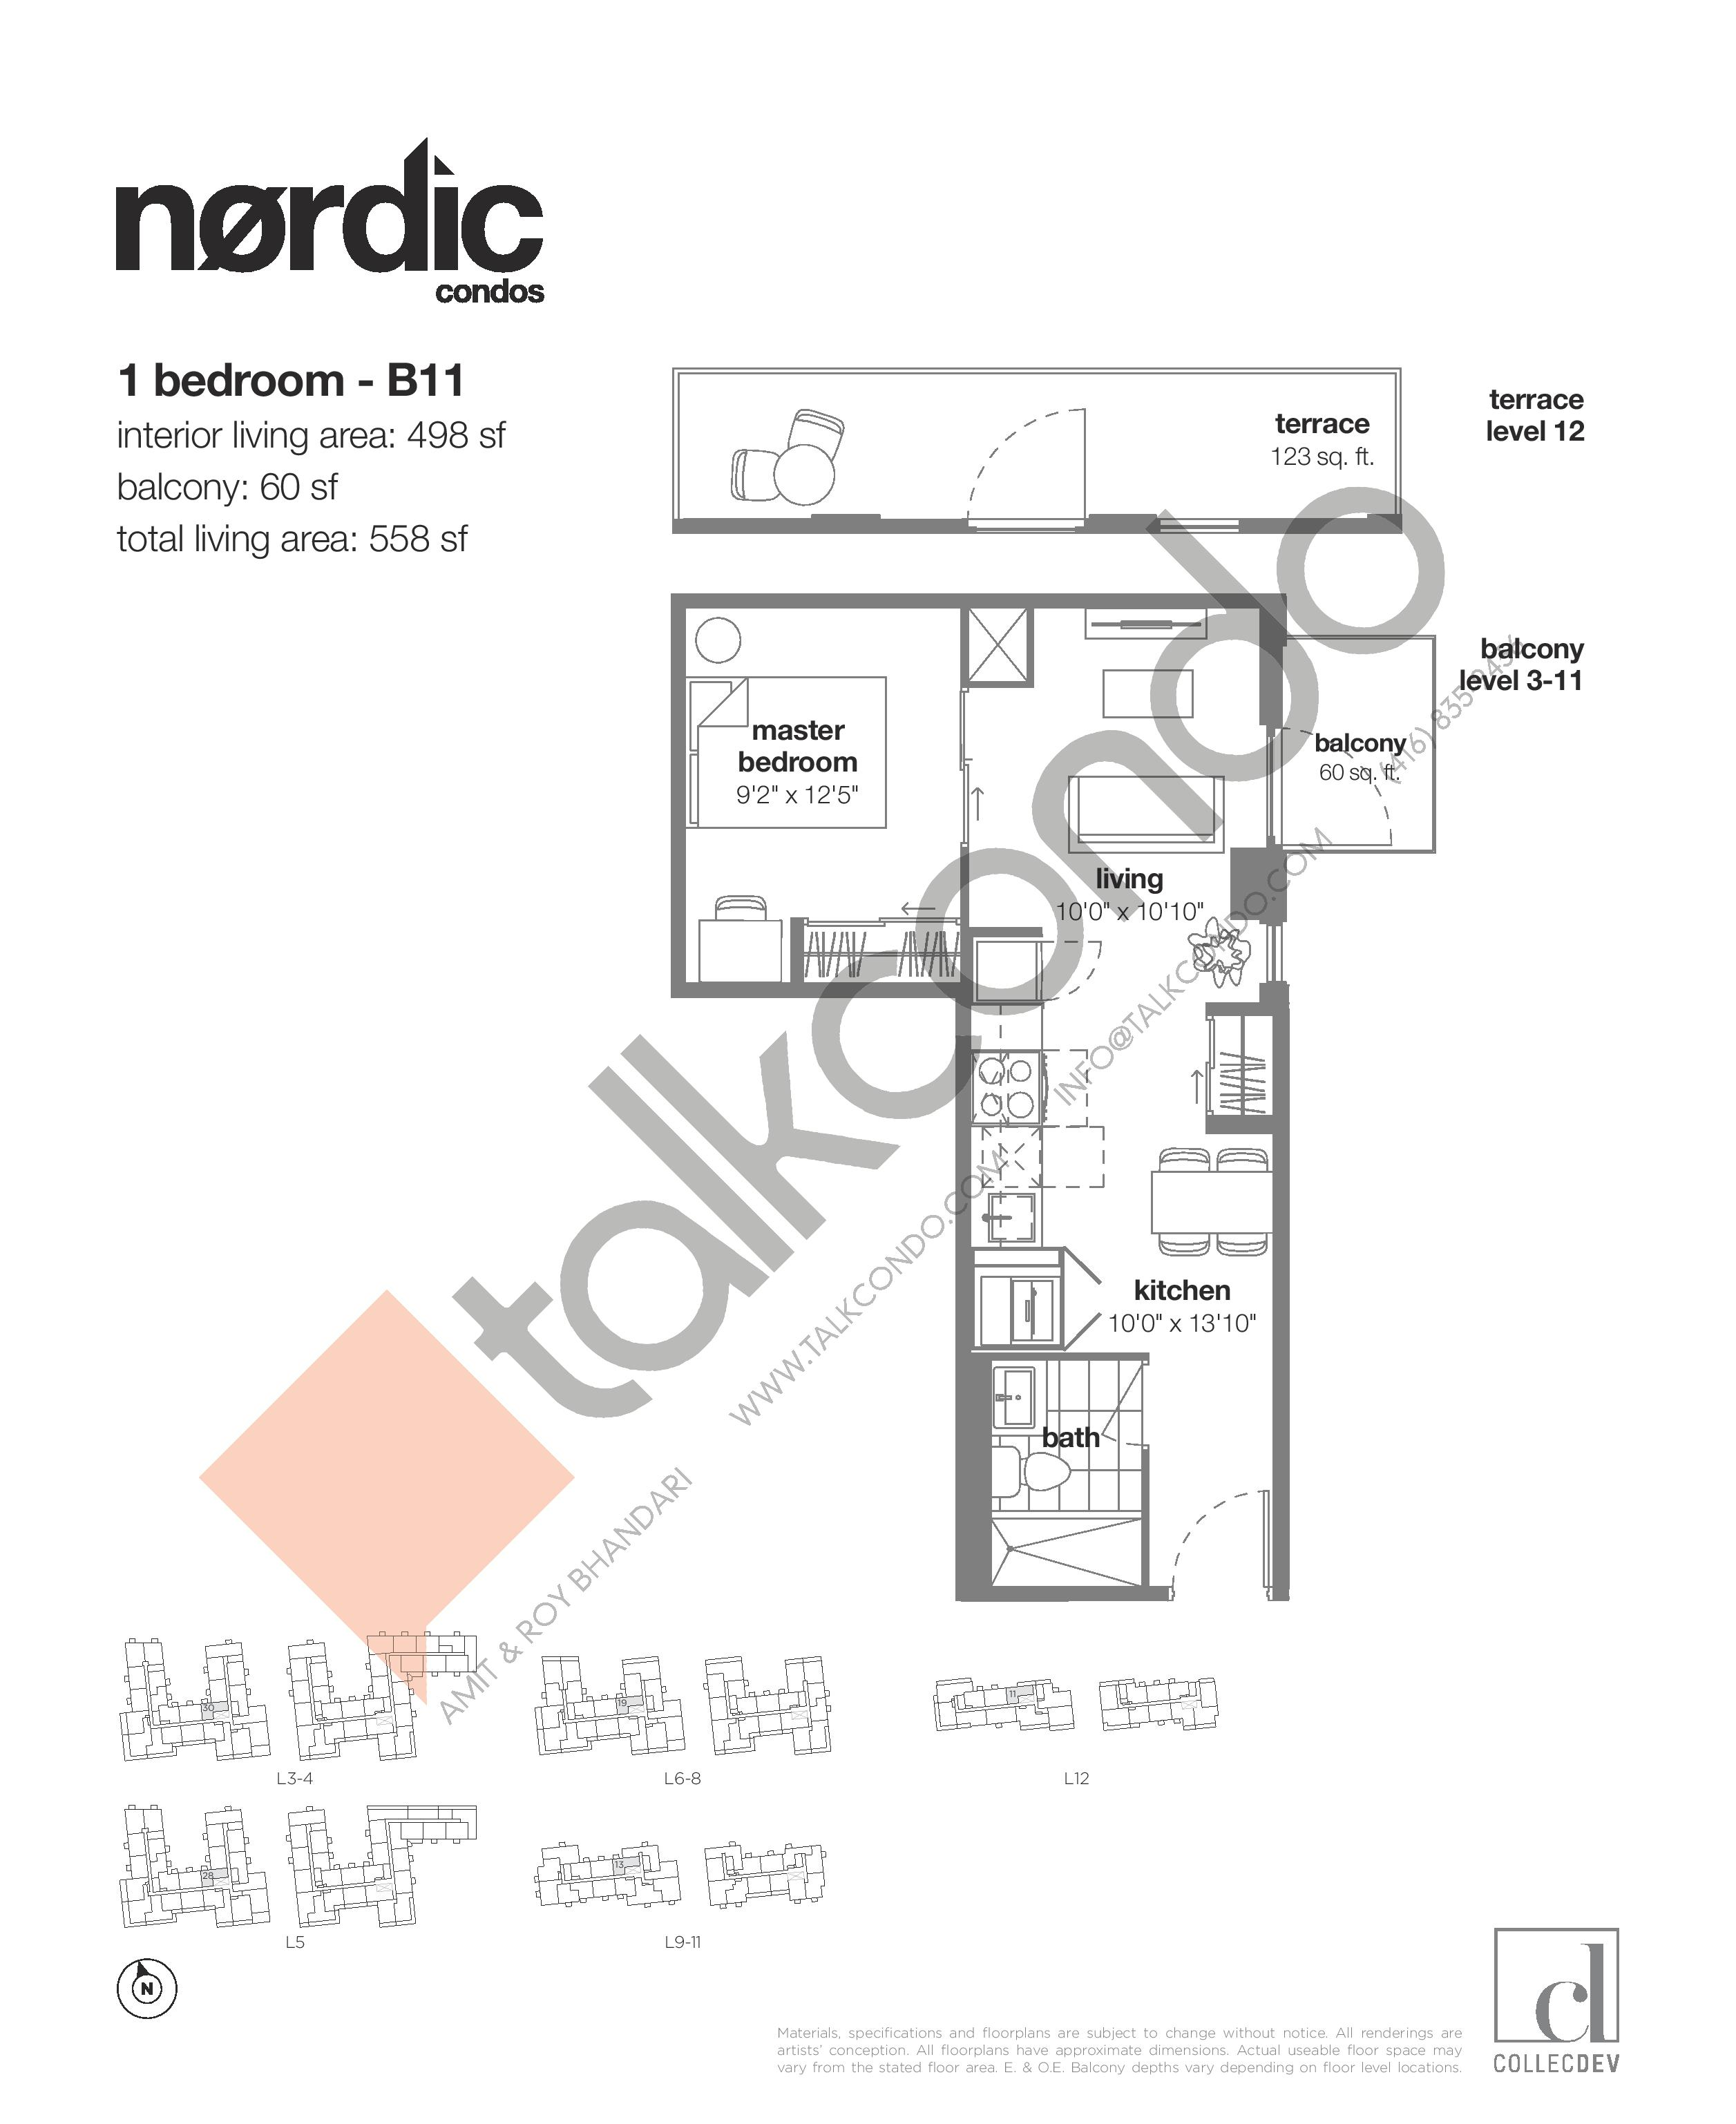 B11 Floor Plan at Nordic Condos - 498 sq.ft